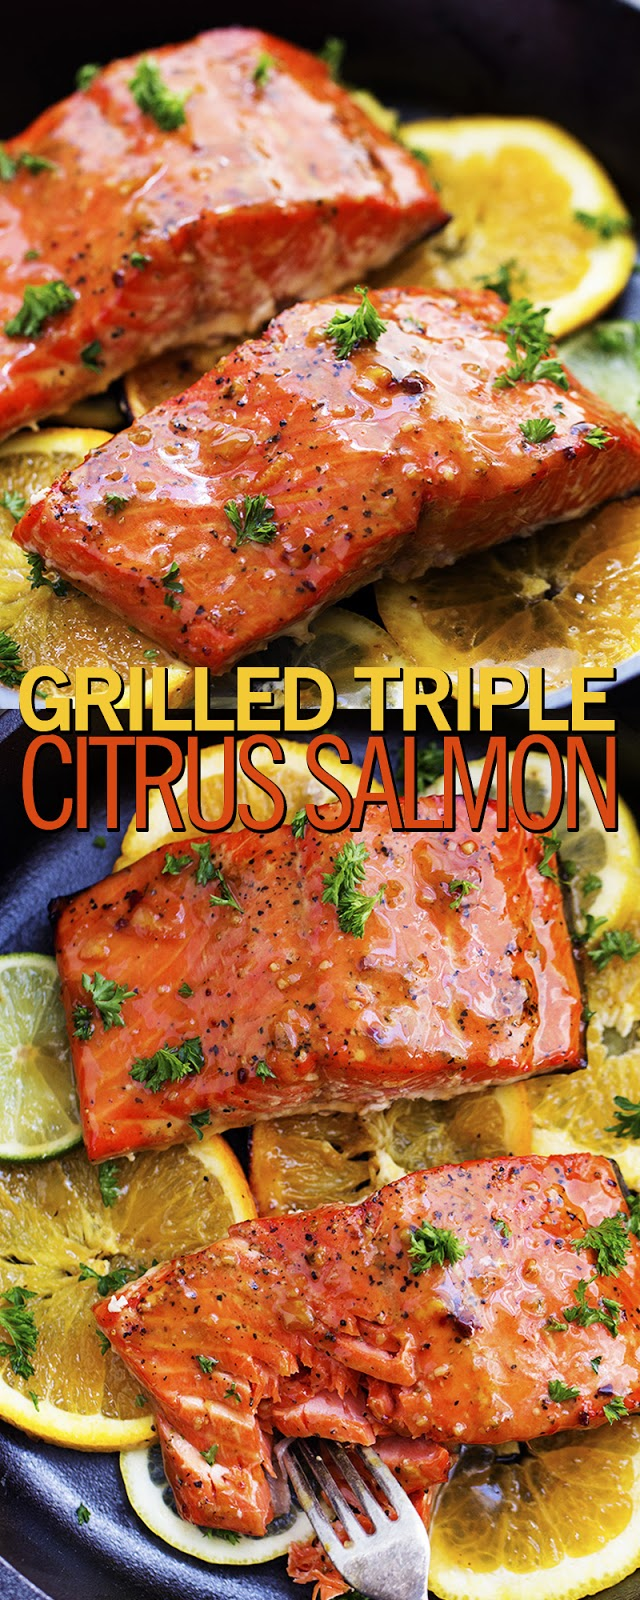 GRILLED TRIPLE CITRUS SALMON